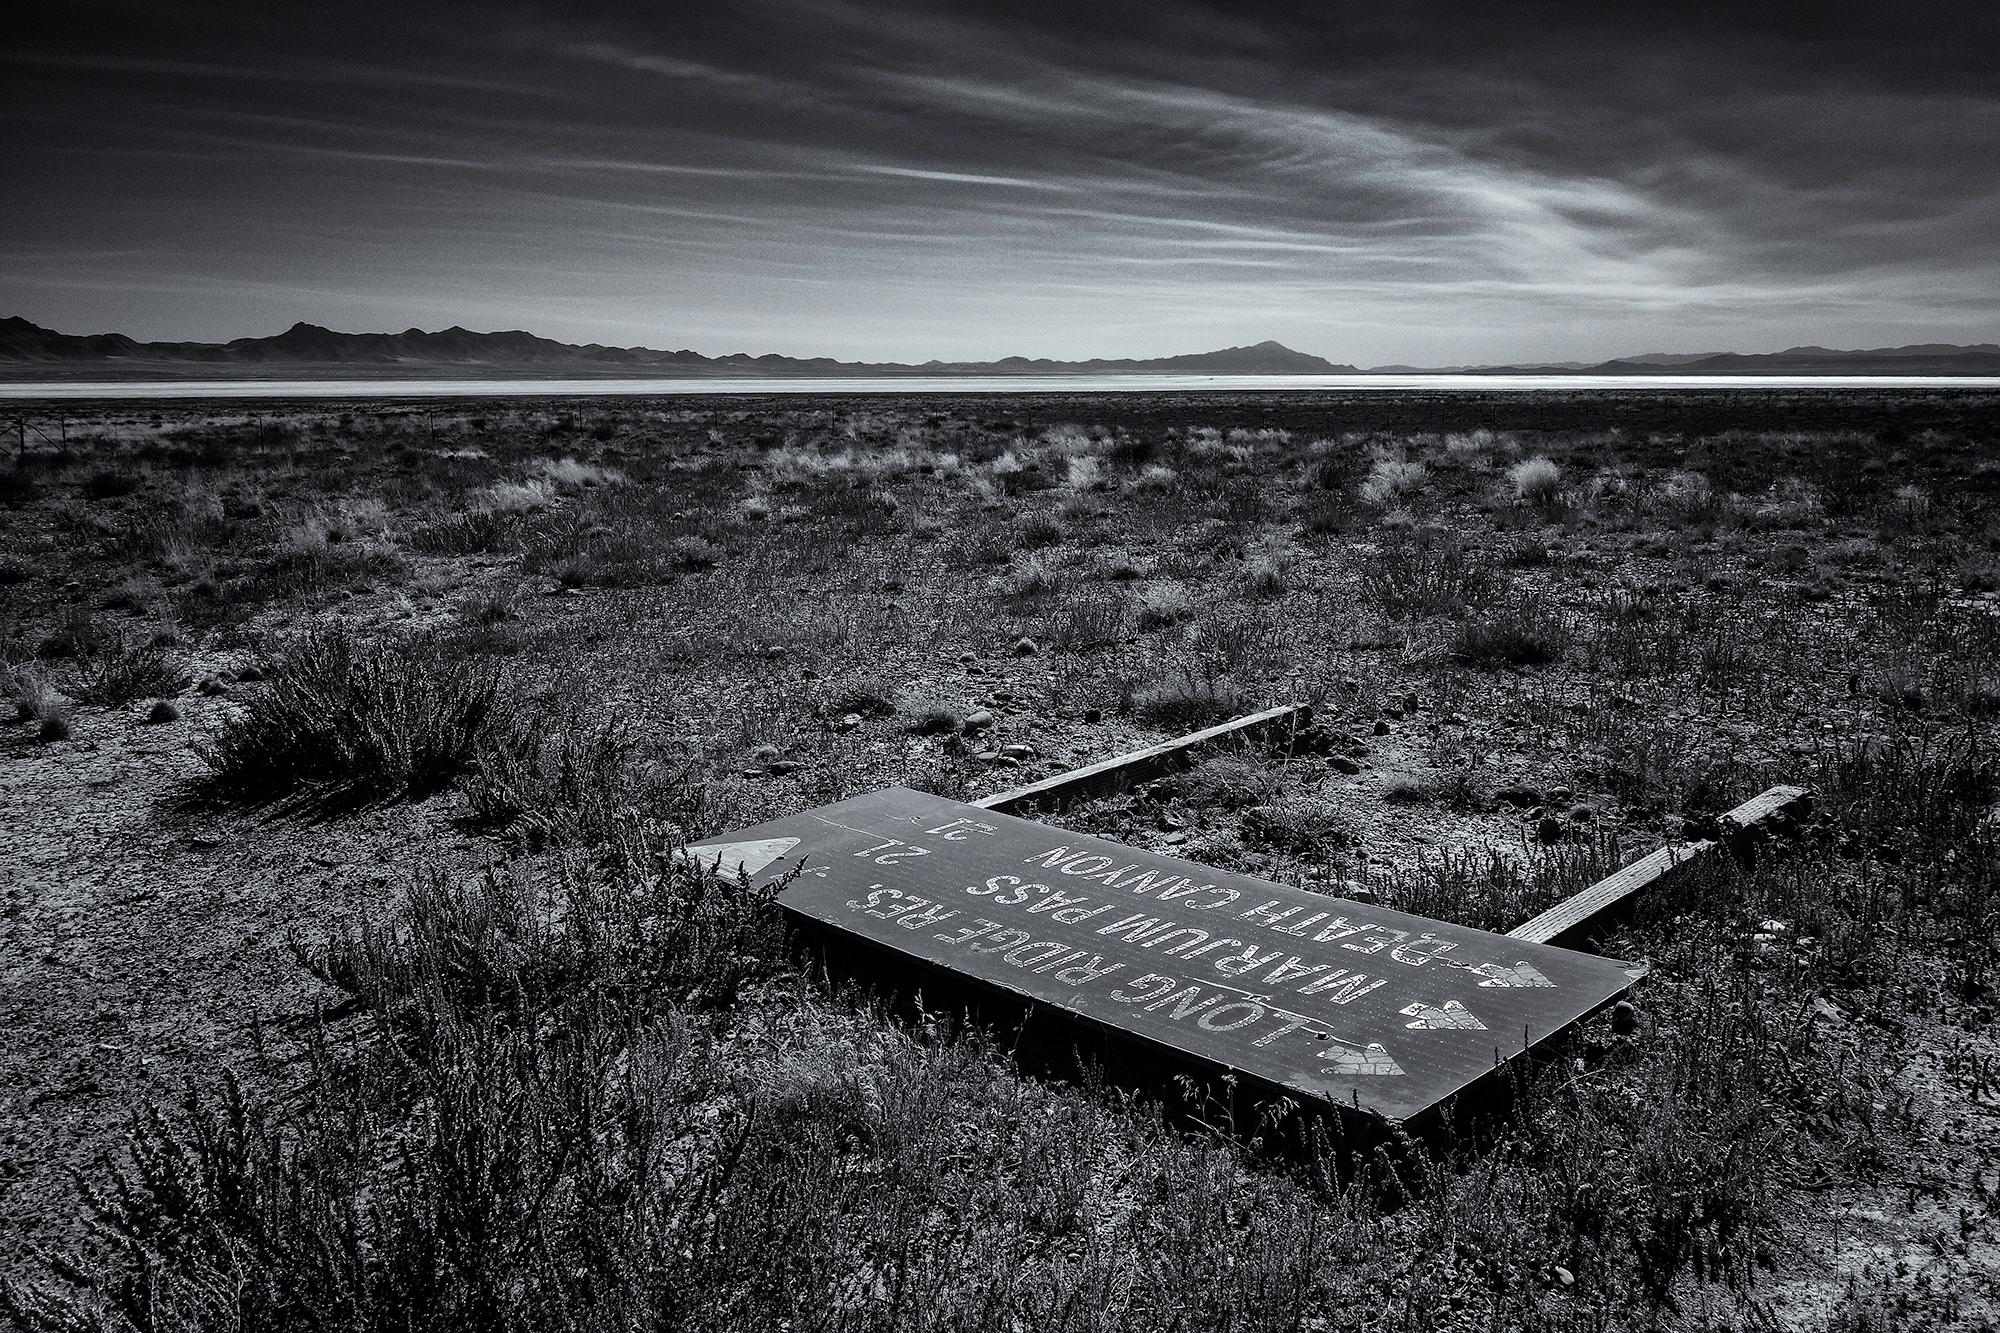 Nevada Basin and Range, #1, Highway 50, Nevada, 2017